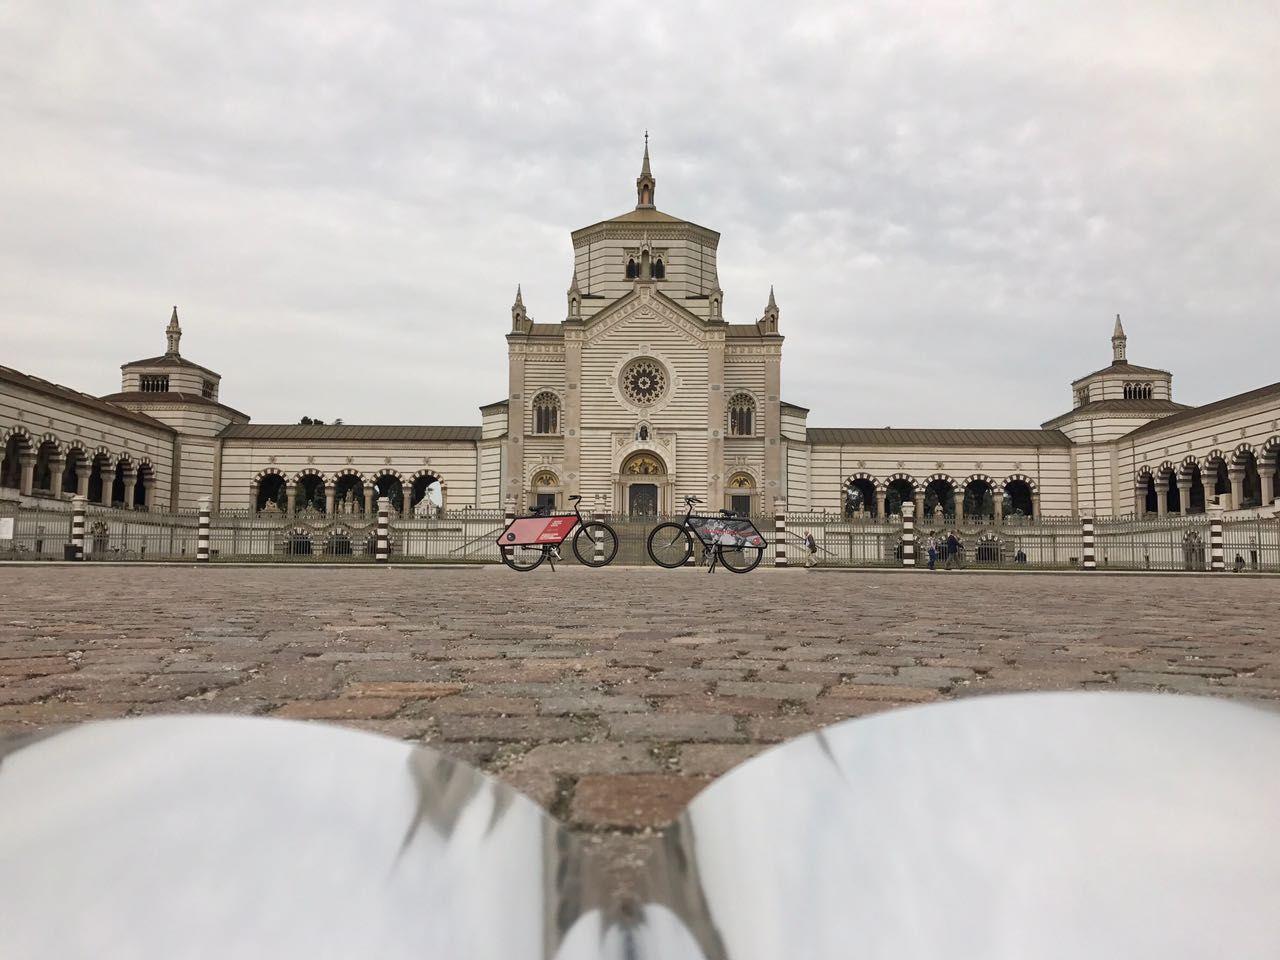 Modular Lighting Instruments' new Sensitive to Light catalogue is traveling around Milan for Milan Design Week! Did you spot our #Supermodular bike team already? Everybody loves it! #SensitiveToLight #Fuorisalone #MilanDesignWeek #Milan